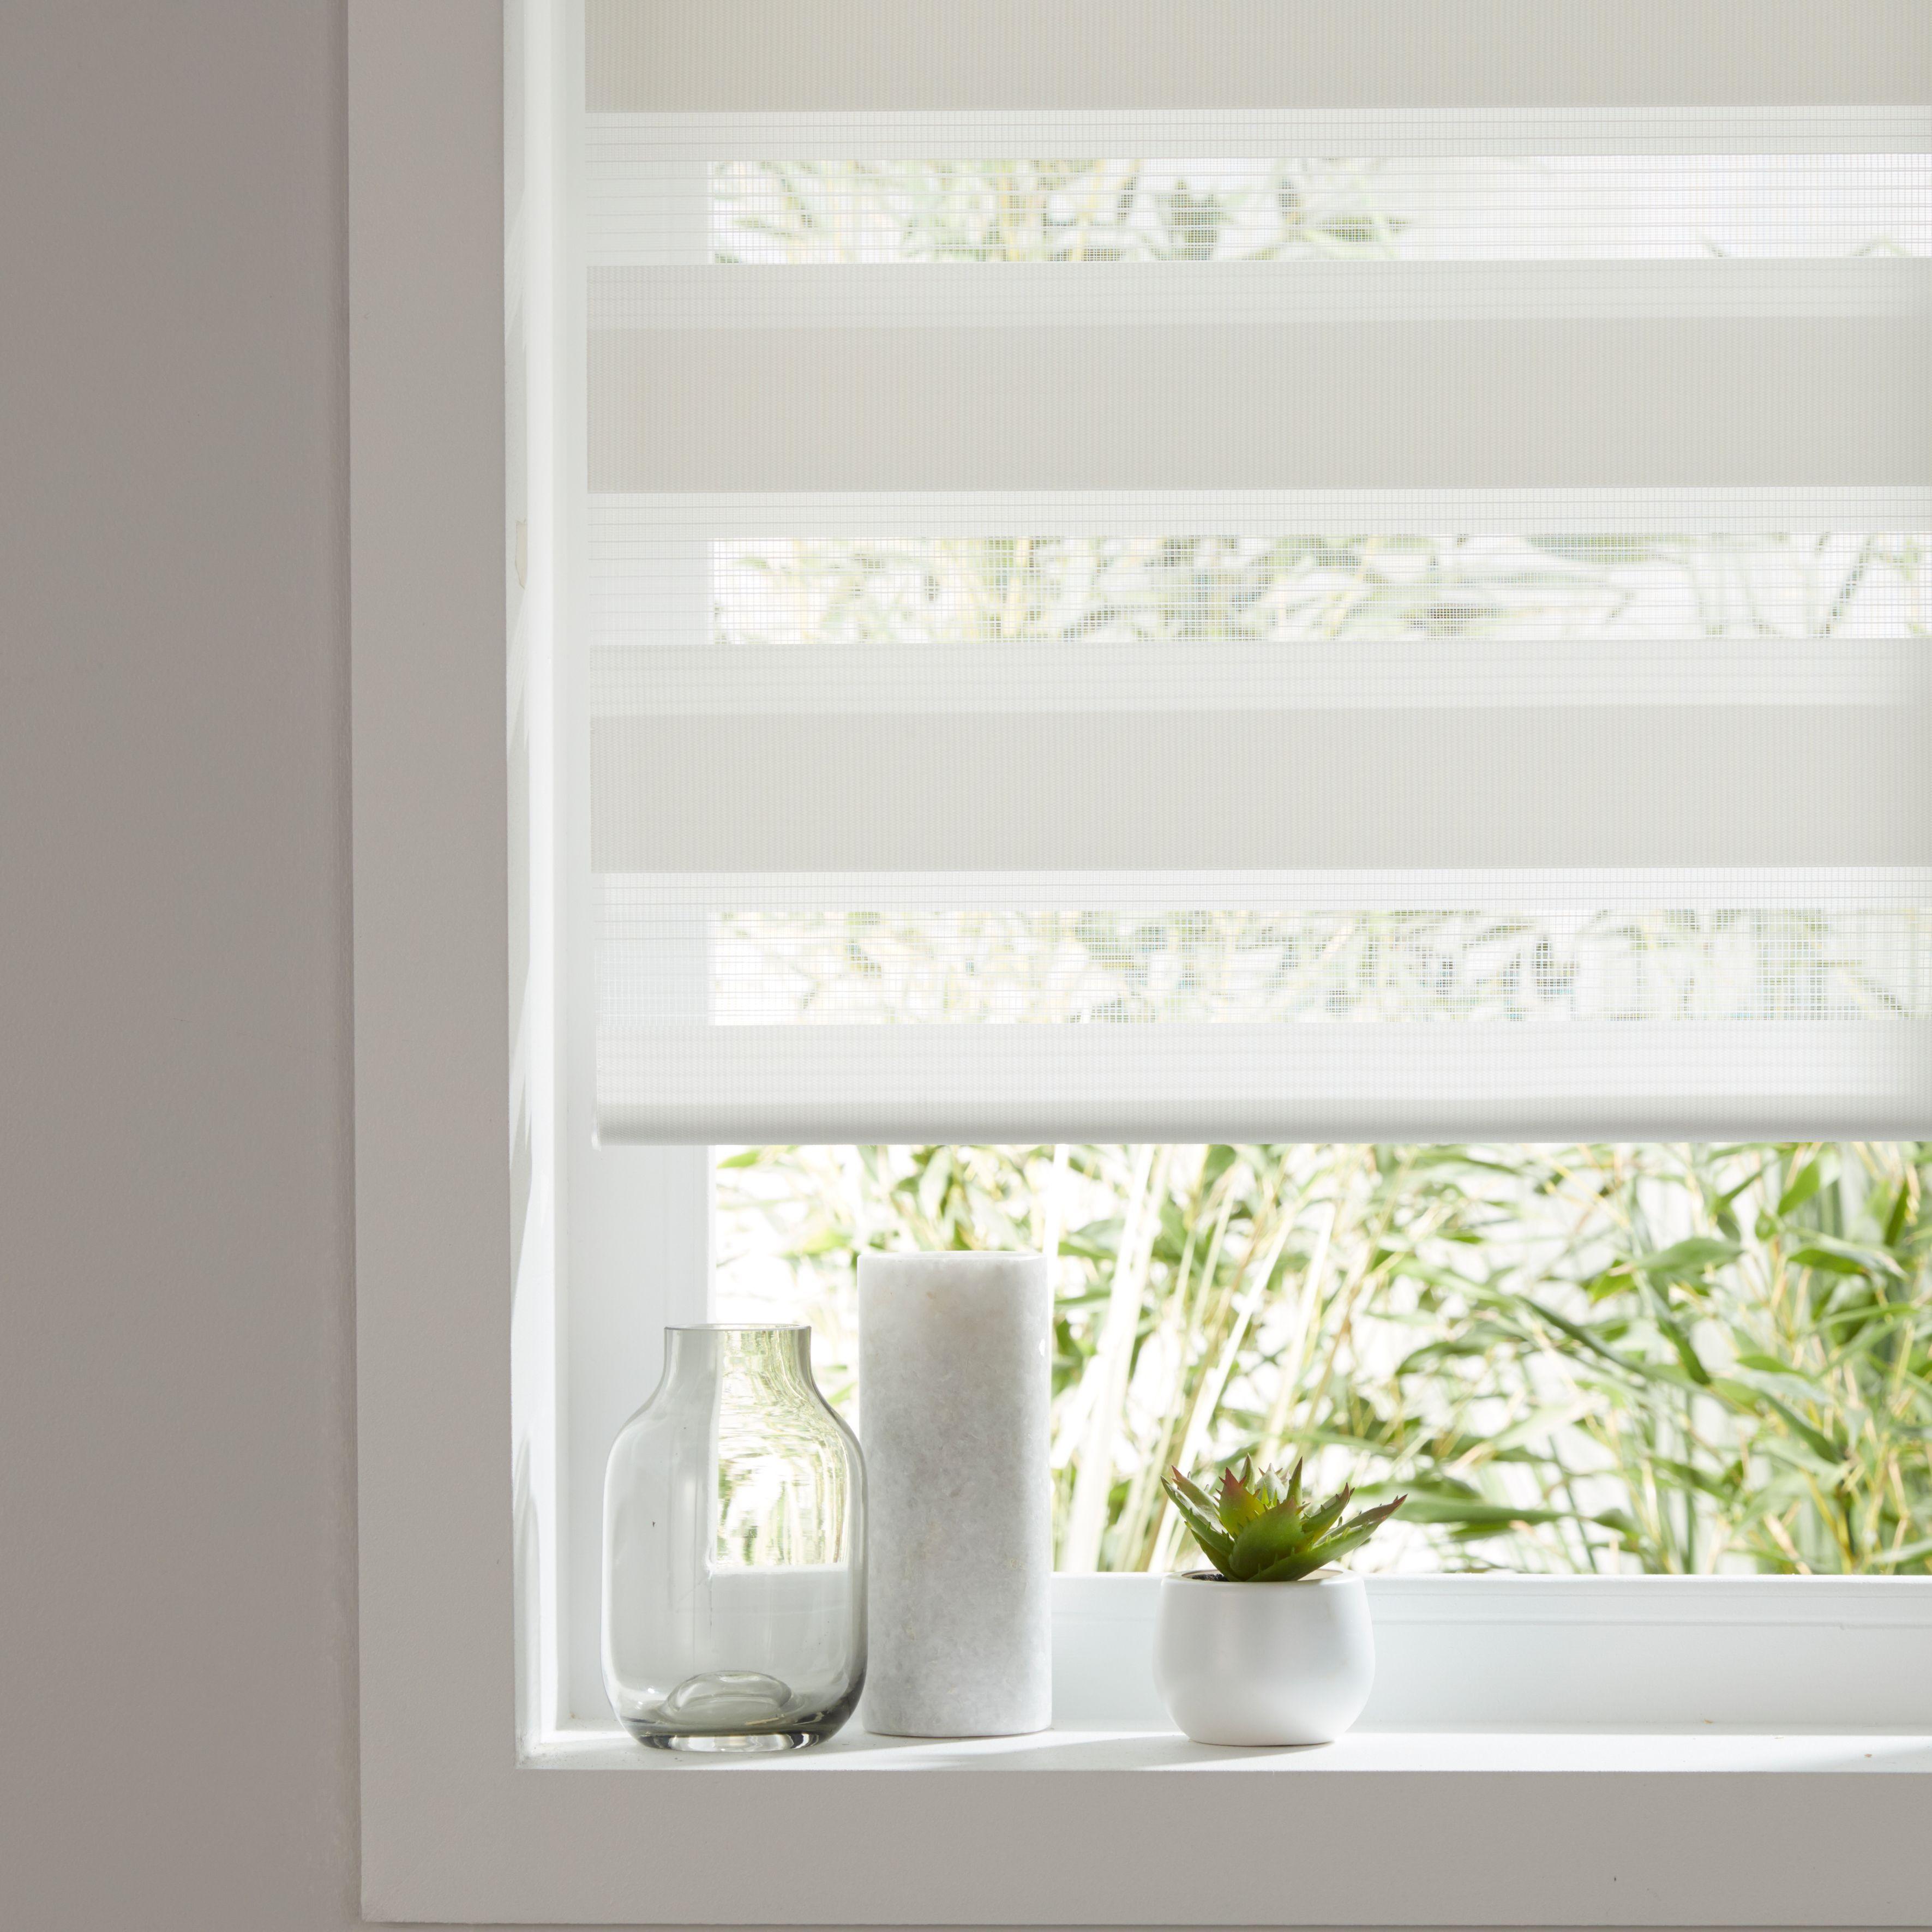 White Blackout Blinds Bathroom Blinds Indoor Shutters Living Room